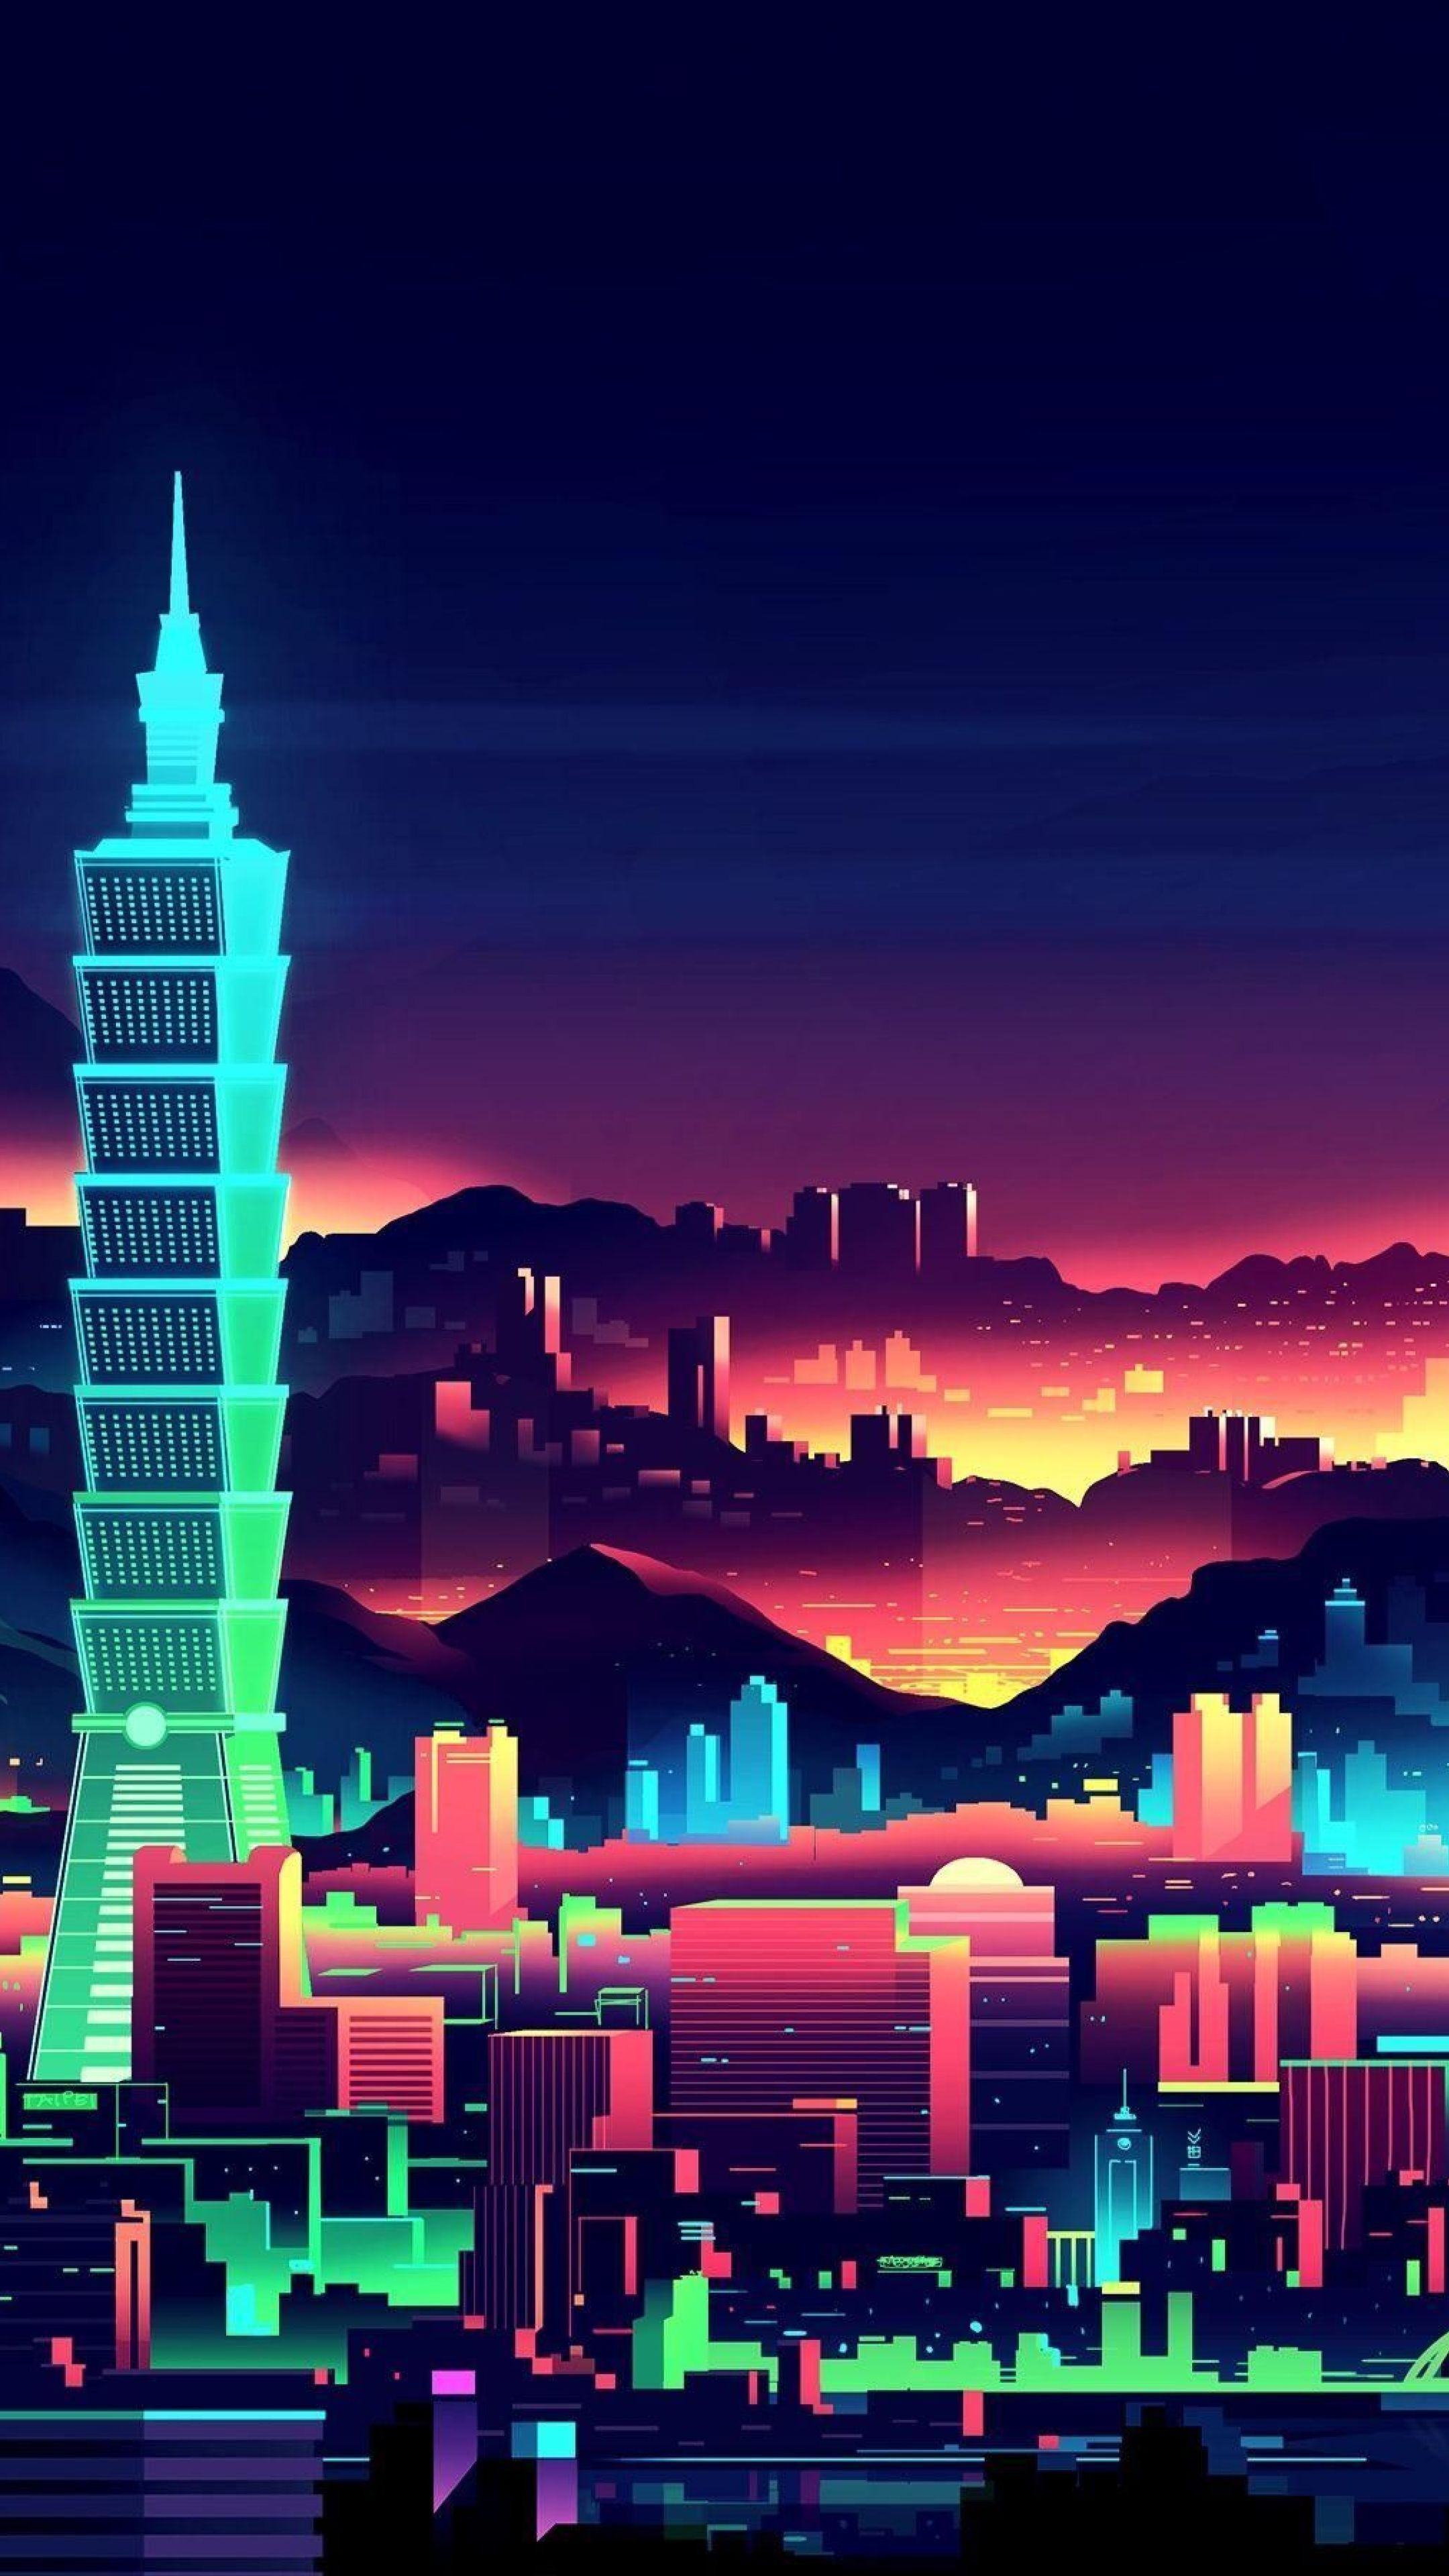 4k Minimalist Wallpapers 259 Kota Cyberpunk City Art Pemandangan Khayalan